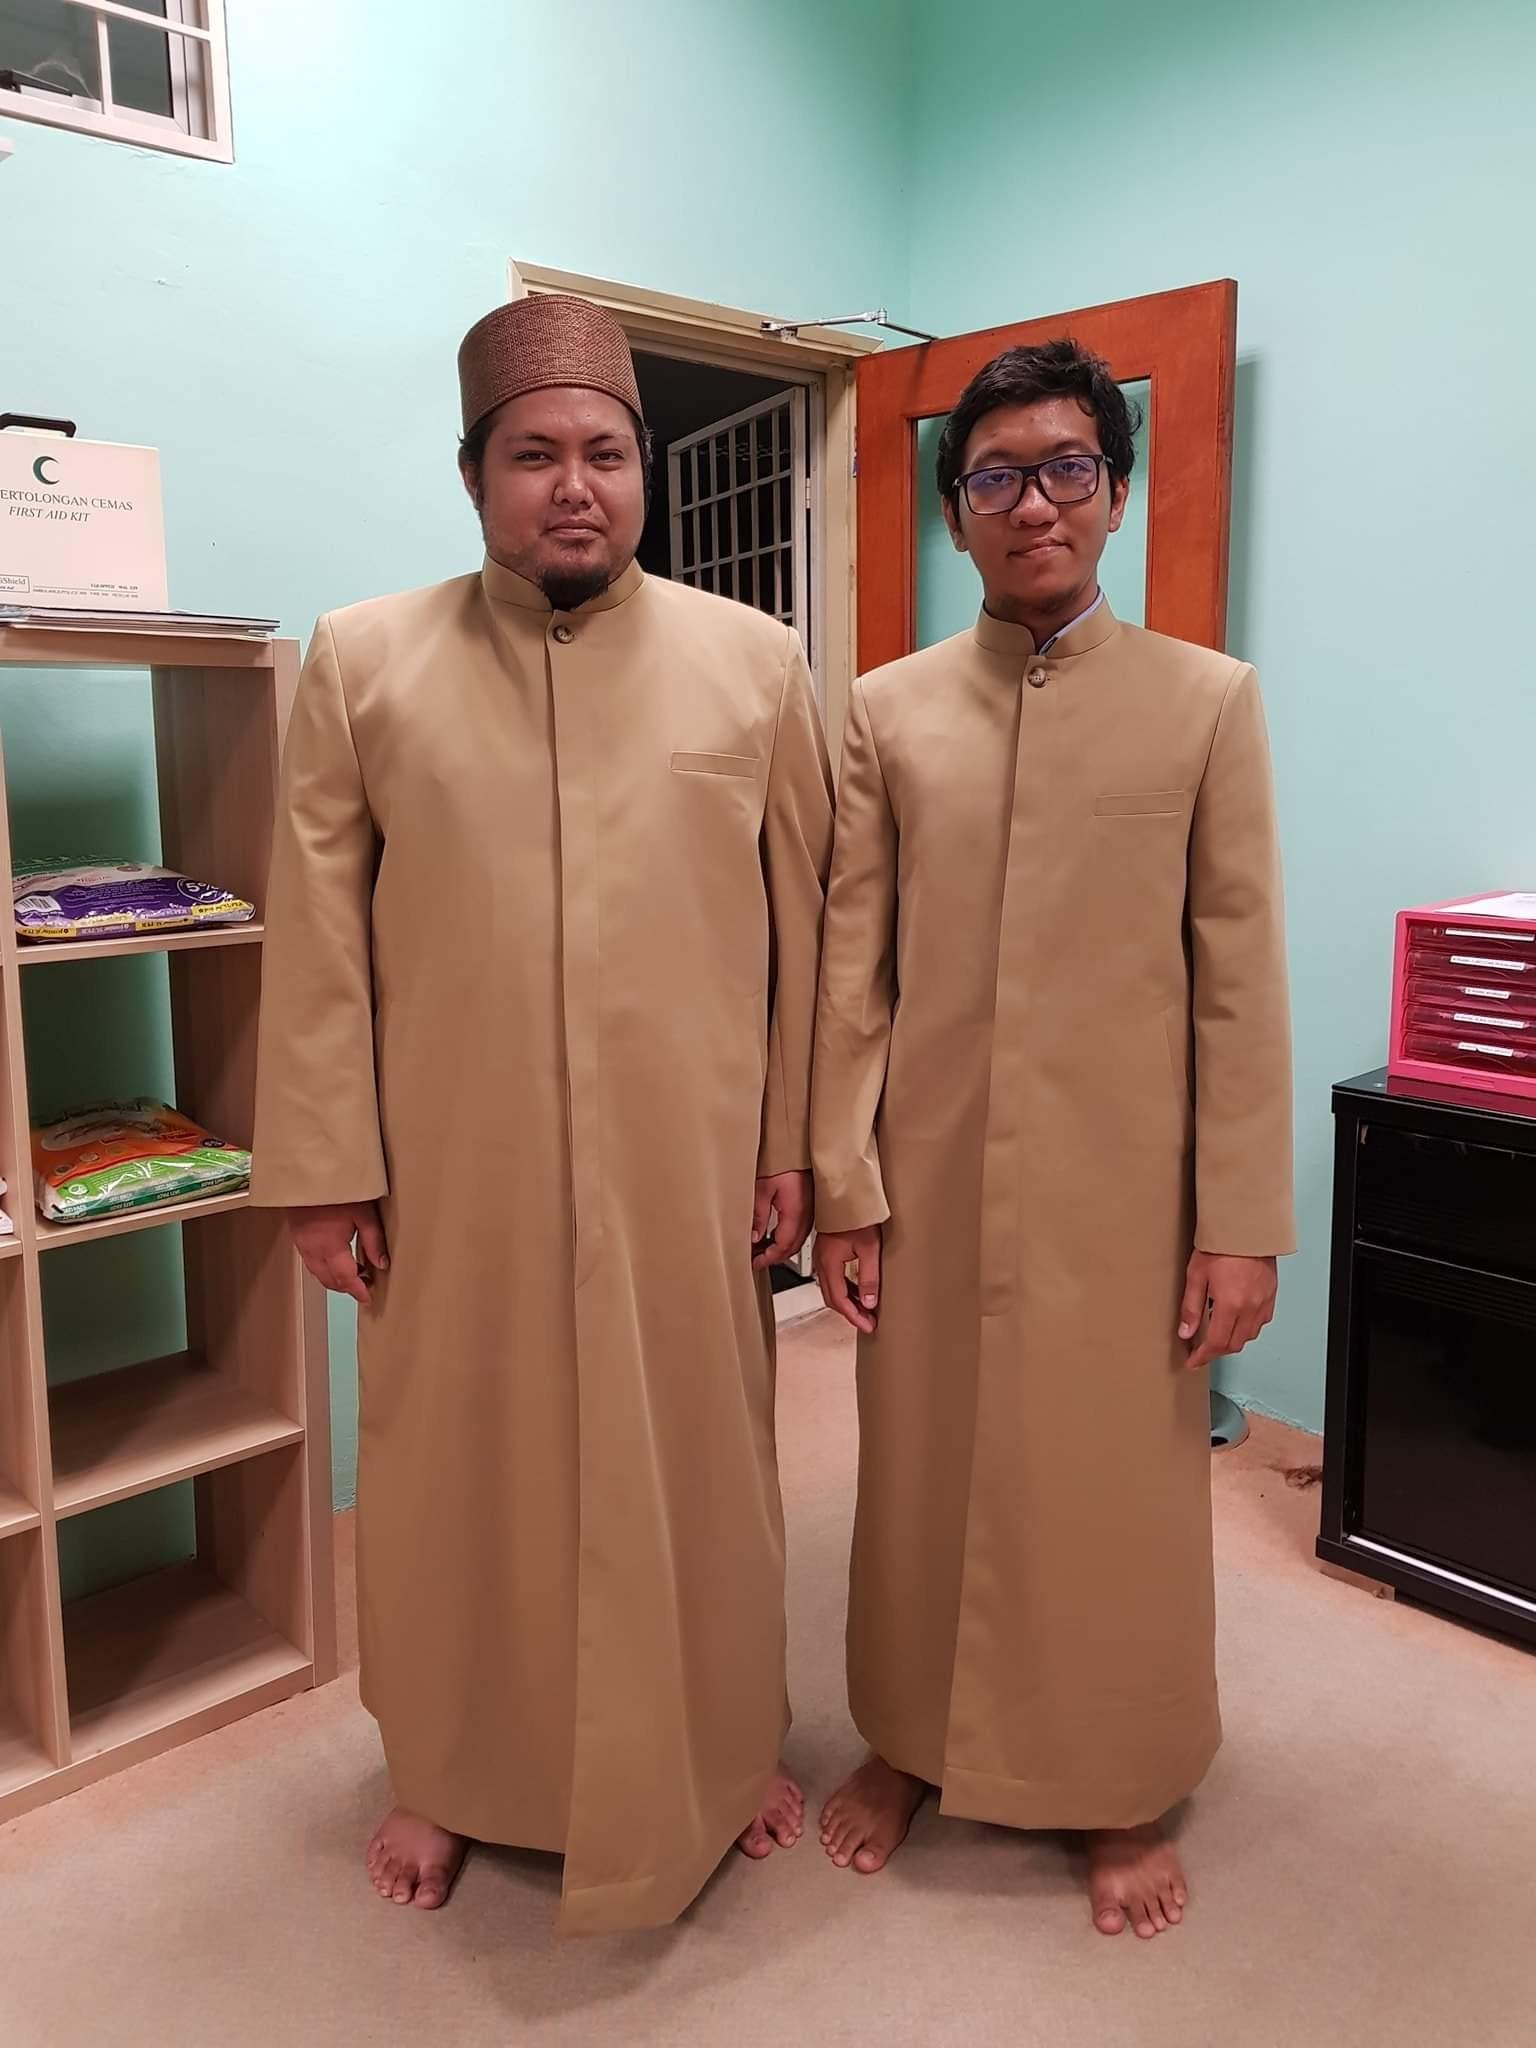 imam thobe Jubah Imam Coat utk Masjid Jamek Sultan Abdul Aziz PJ (Hospital Assunta).